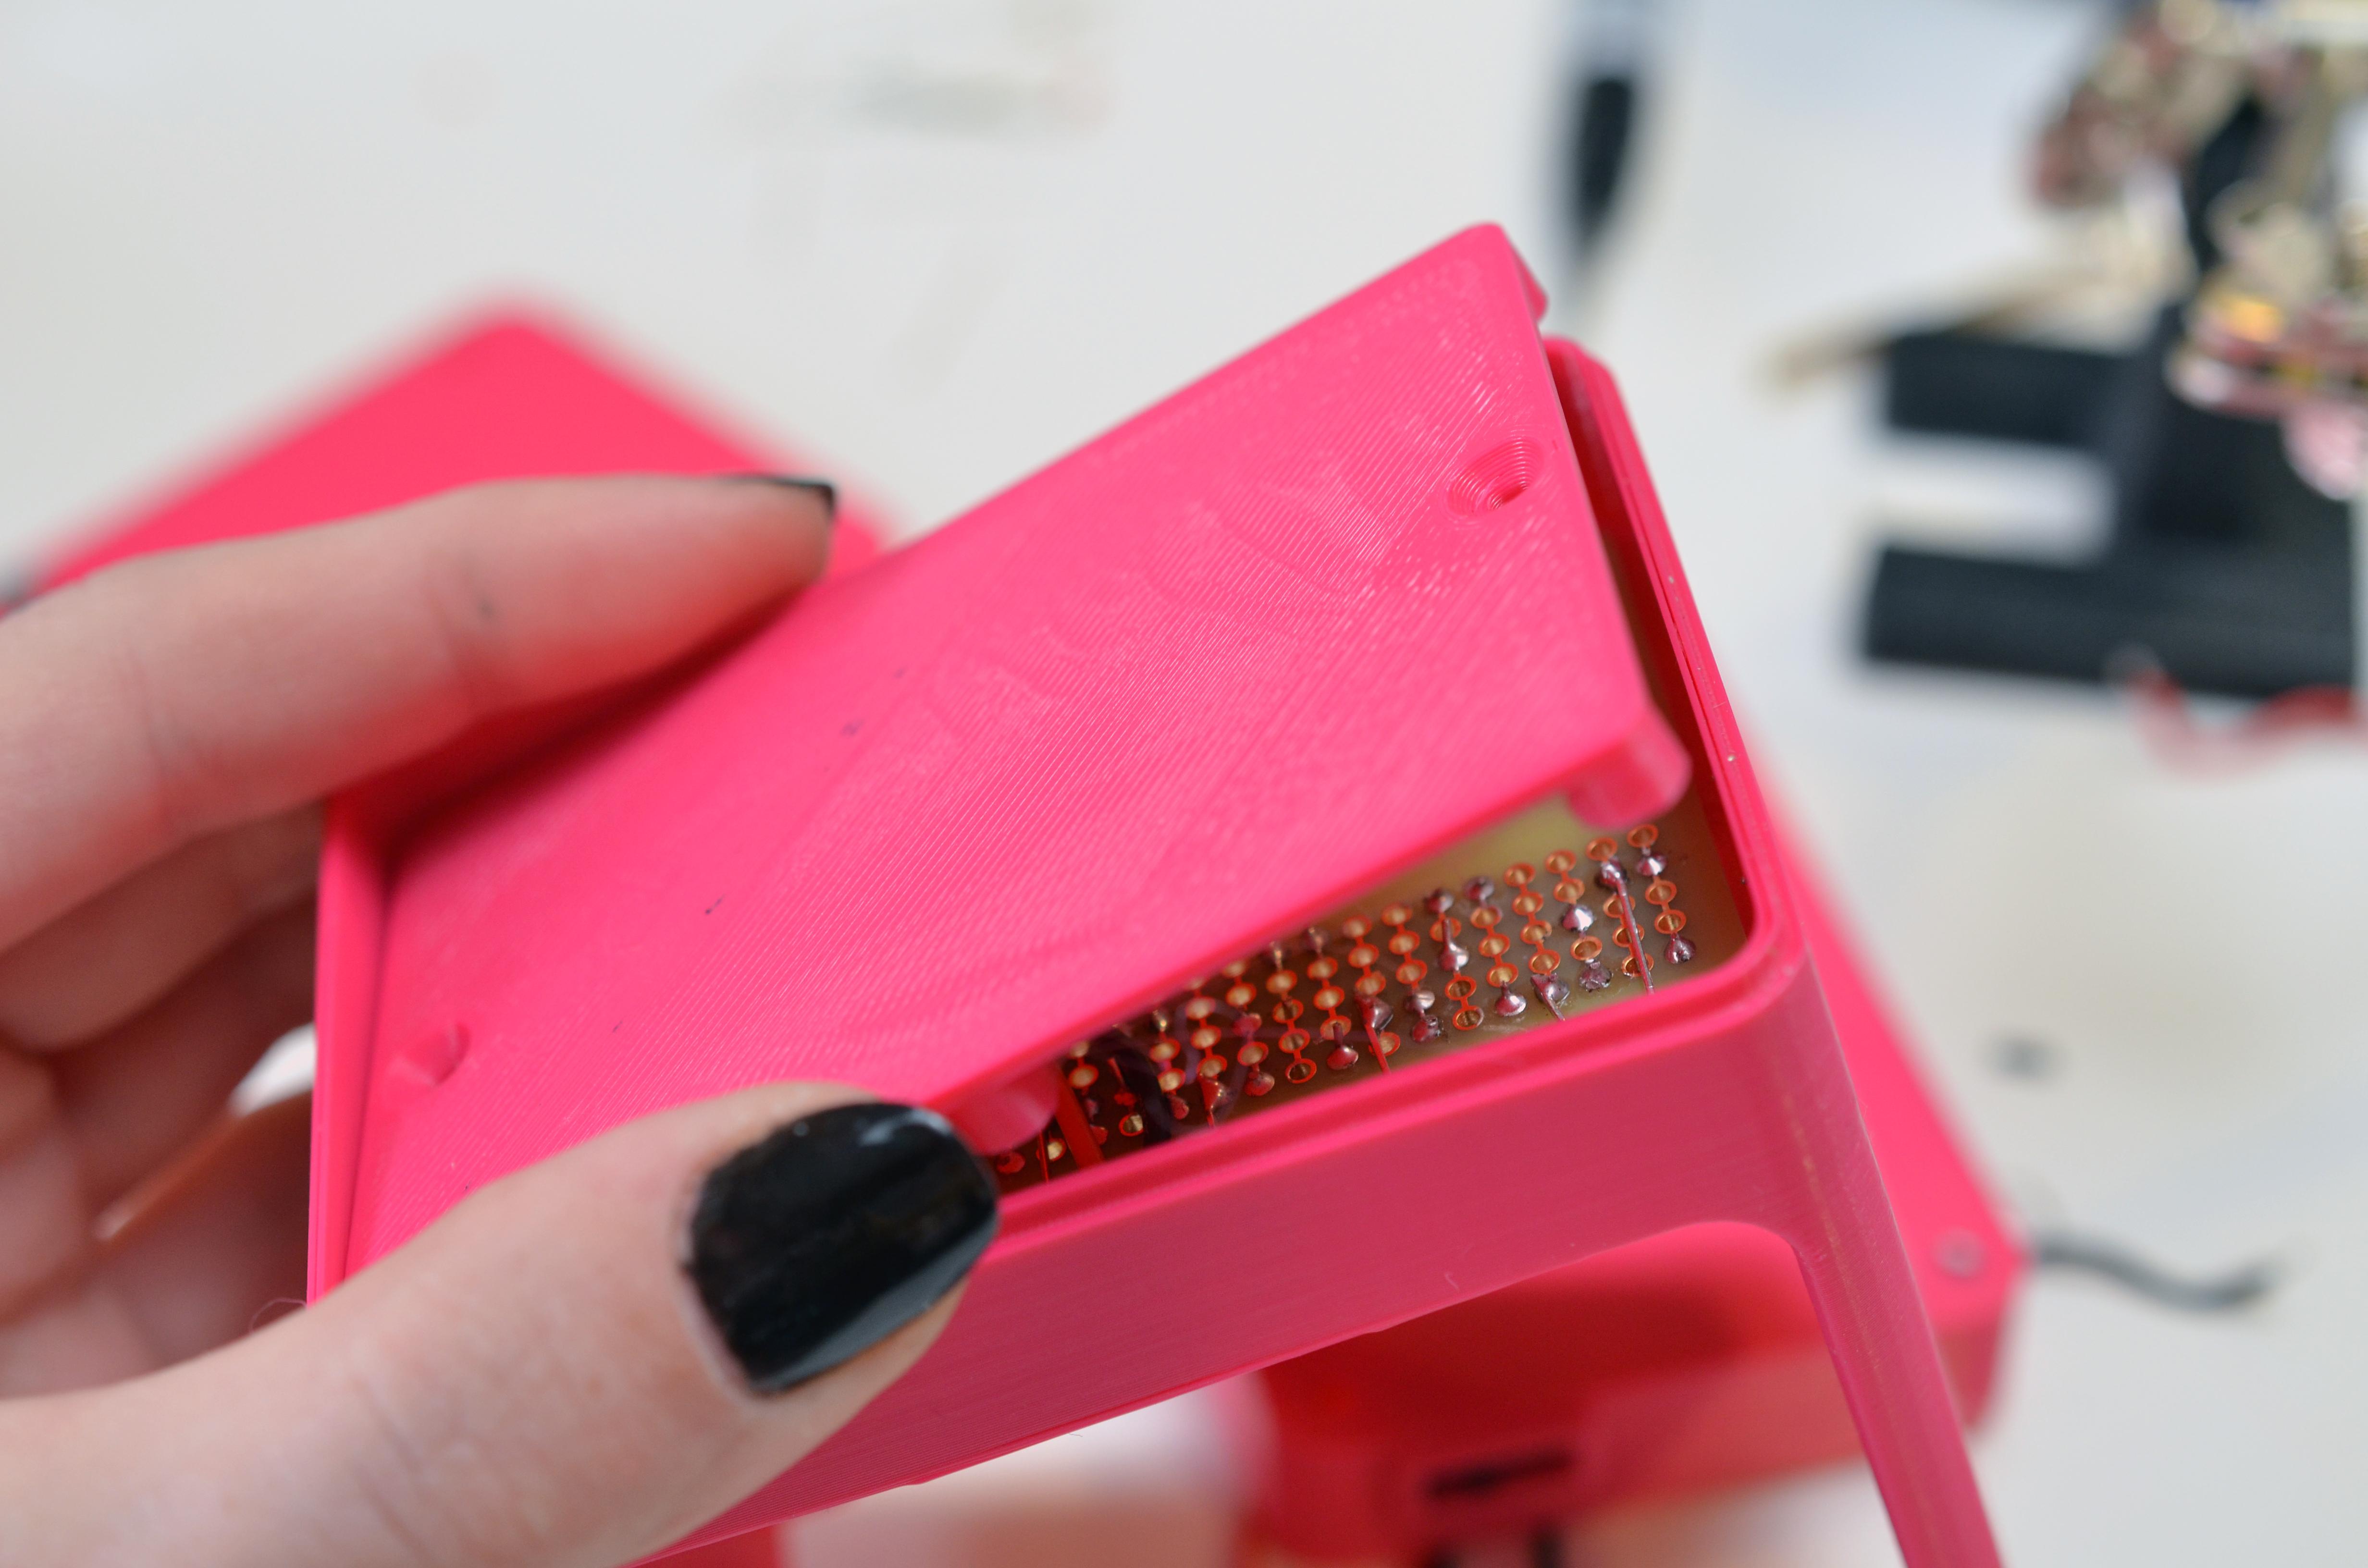 leds_uv-manicure-lamp-compartent-shelf.jpg